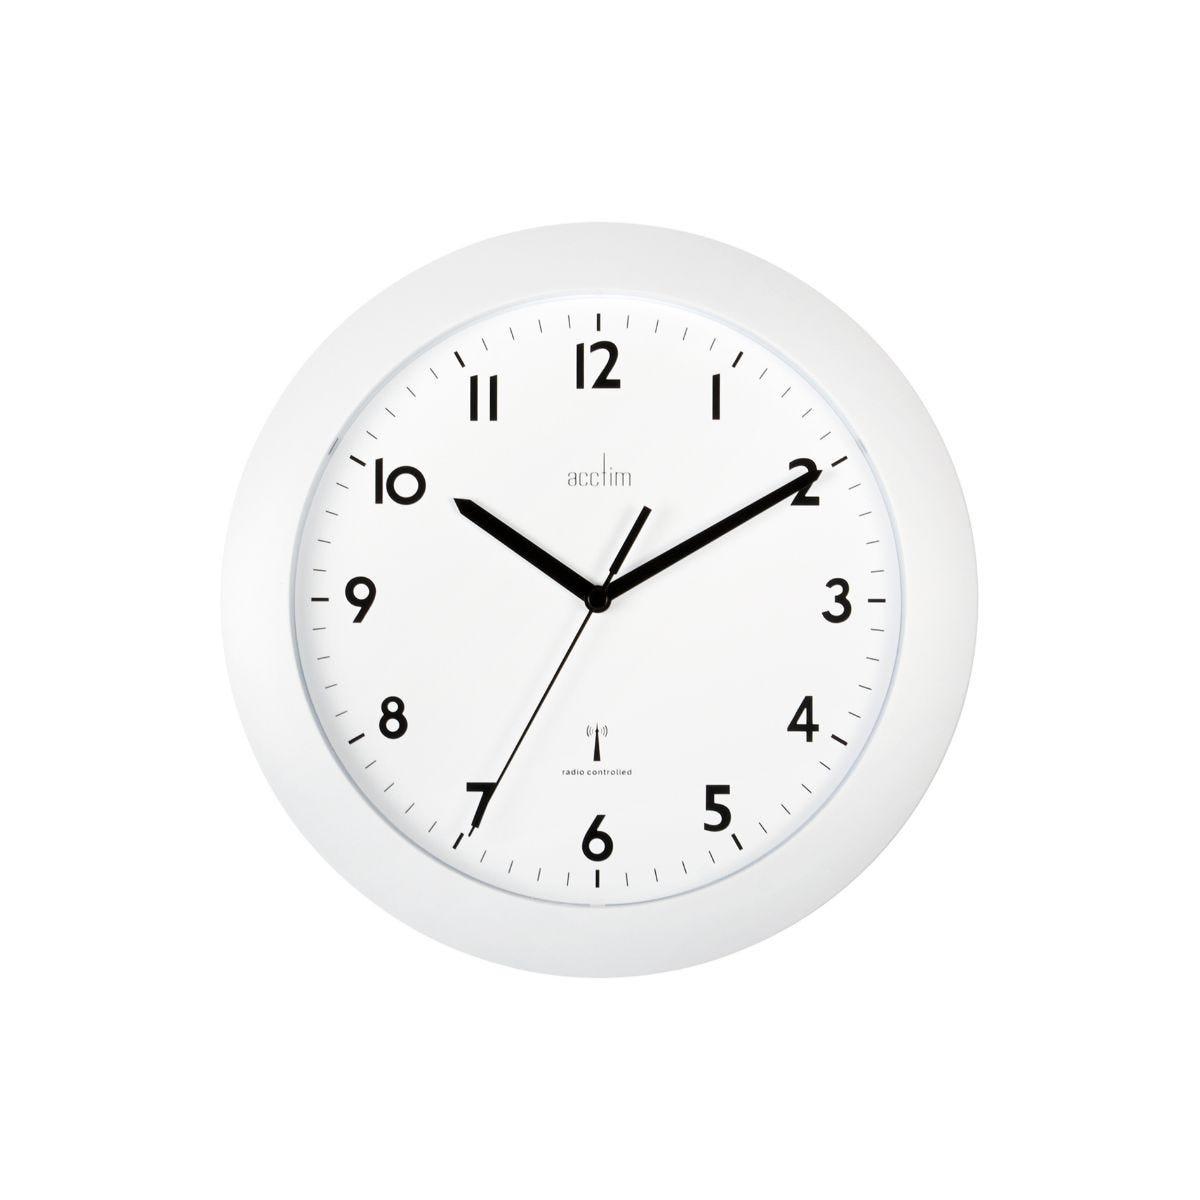 Image of Cadiz Radio Contrld Wall Clock, White